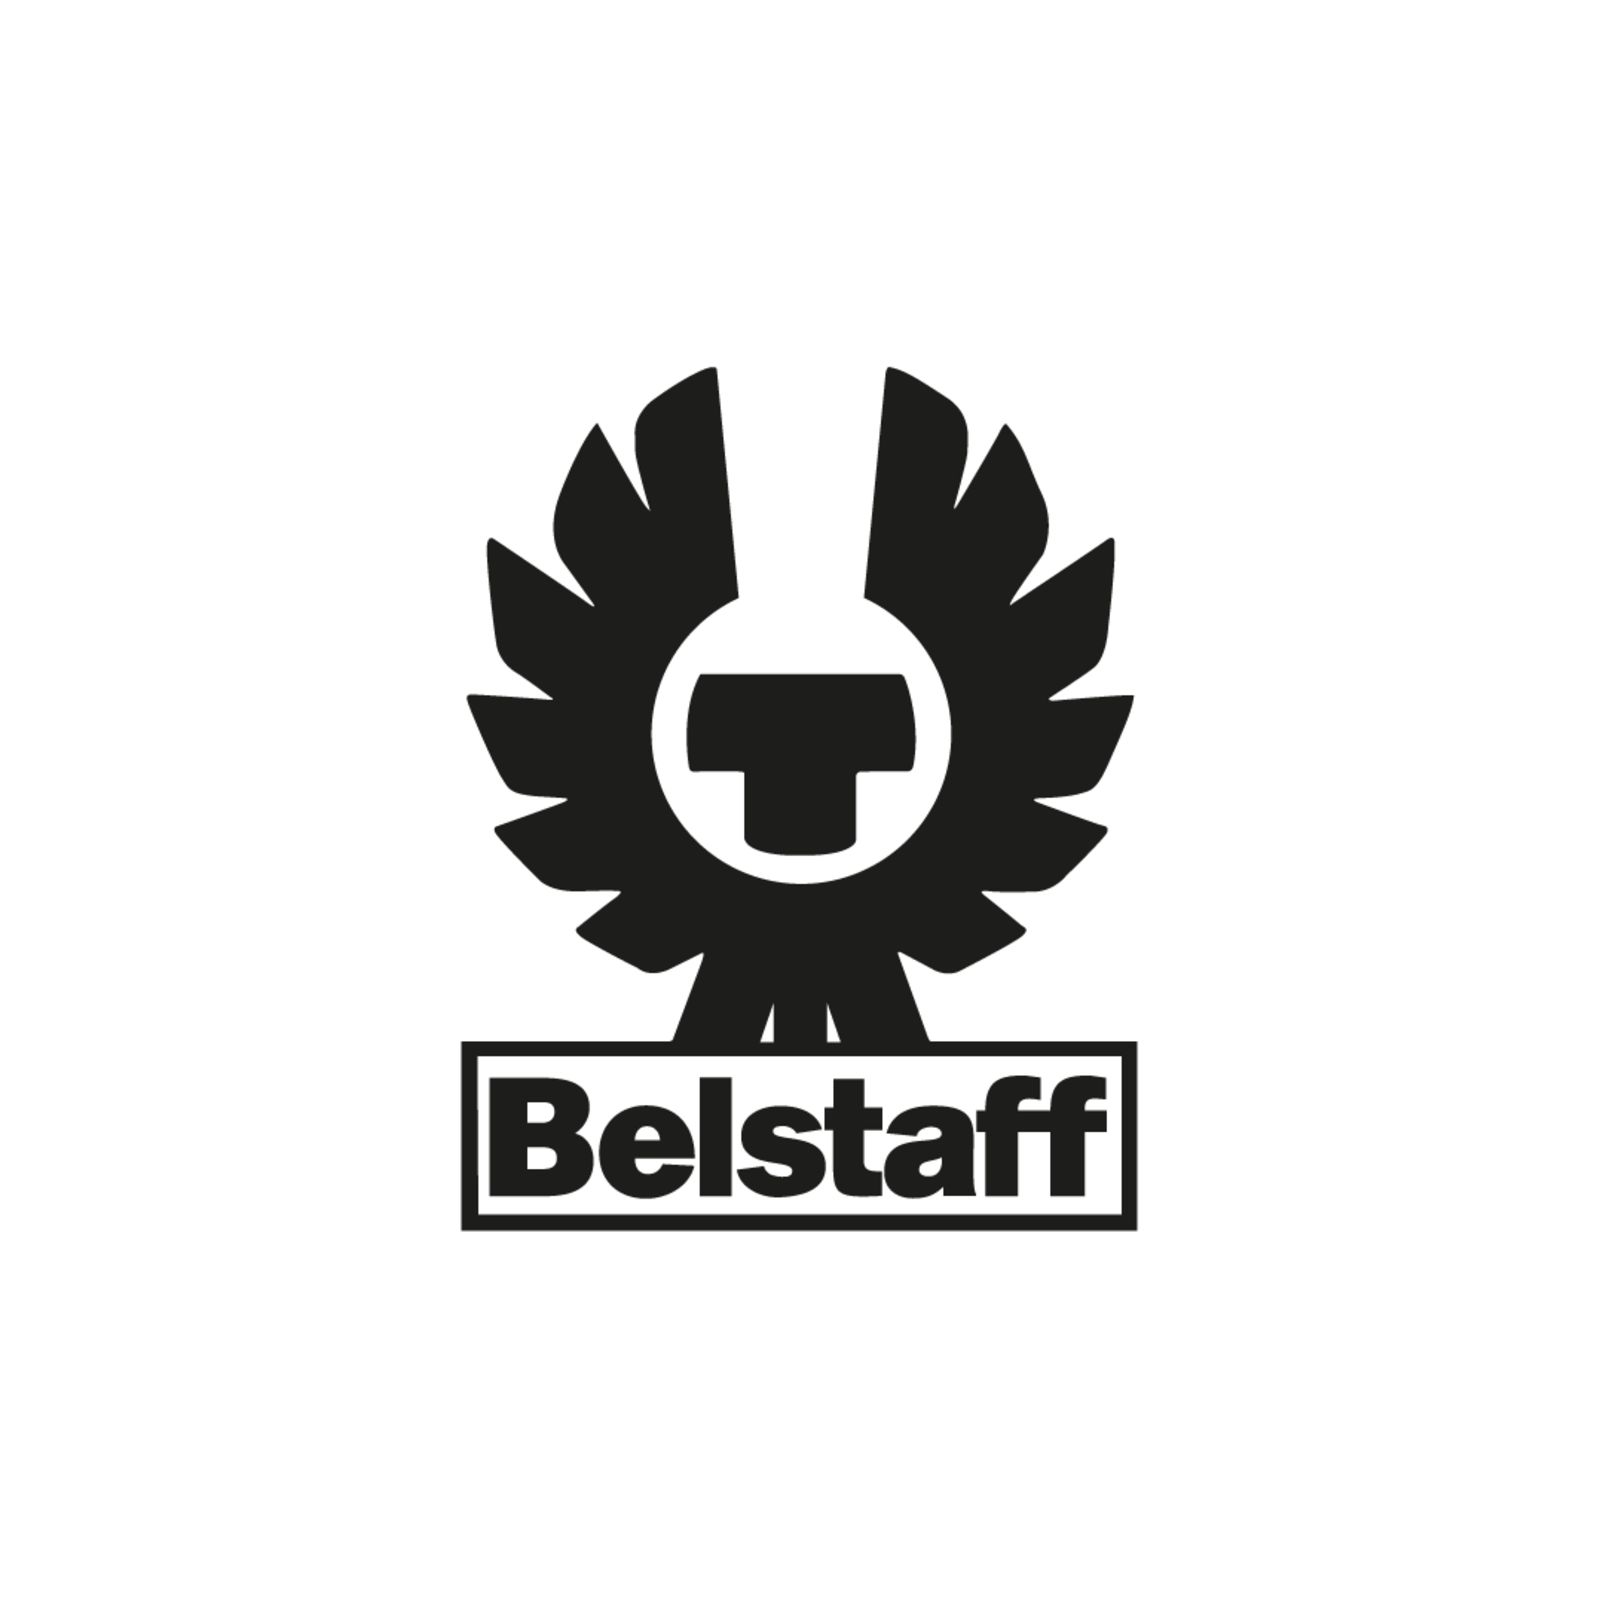 BELSTAFF (Image 1)